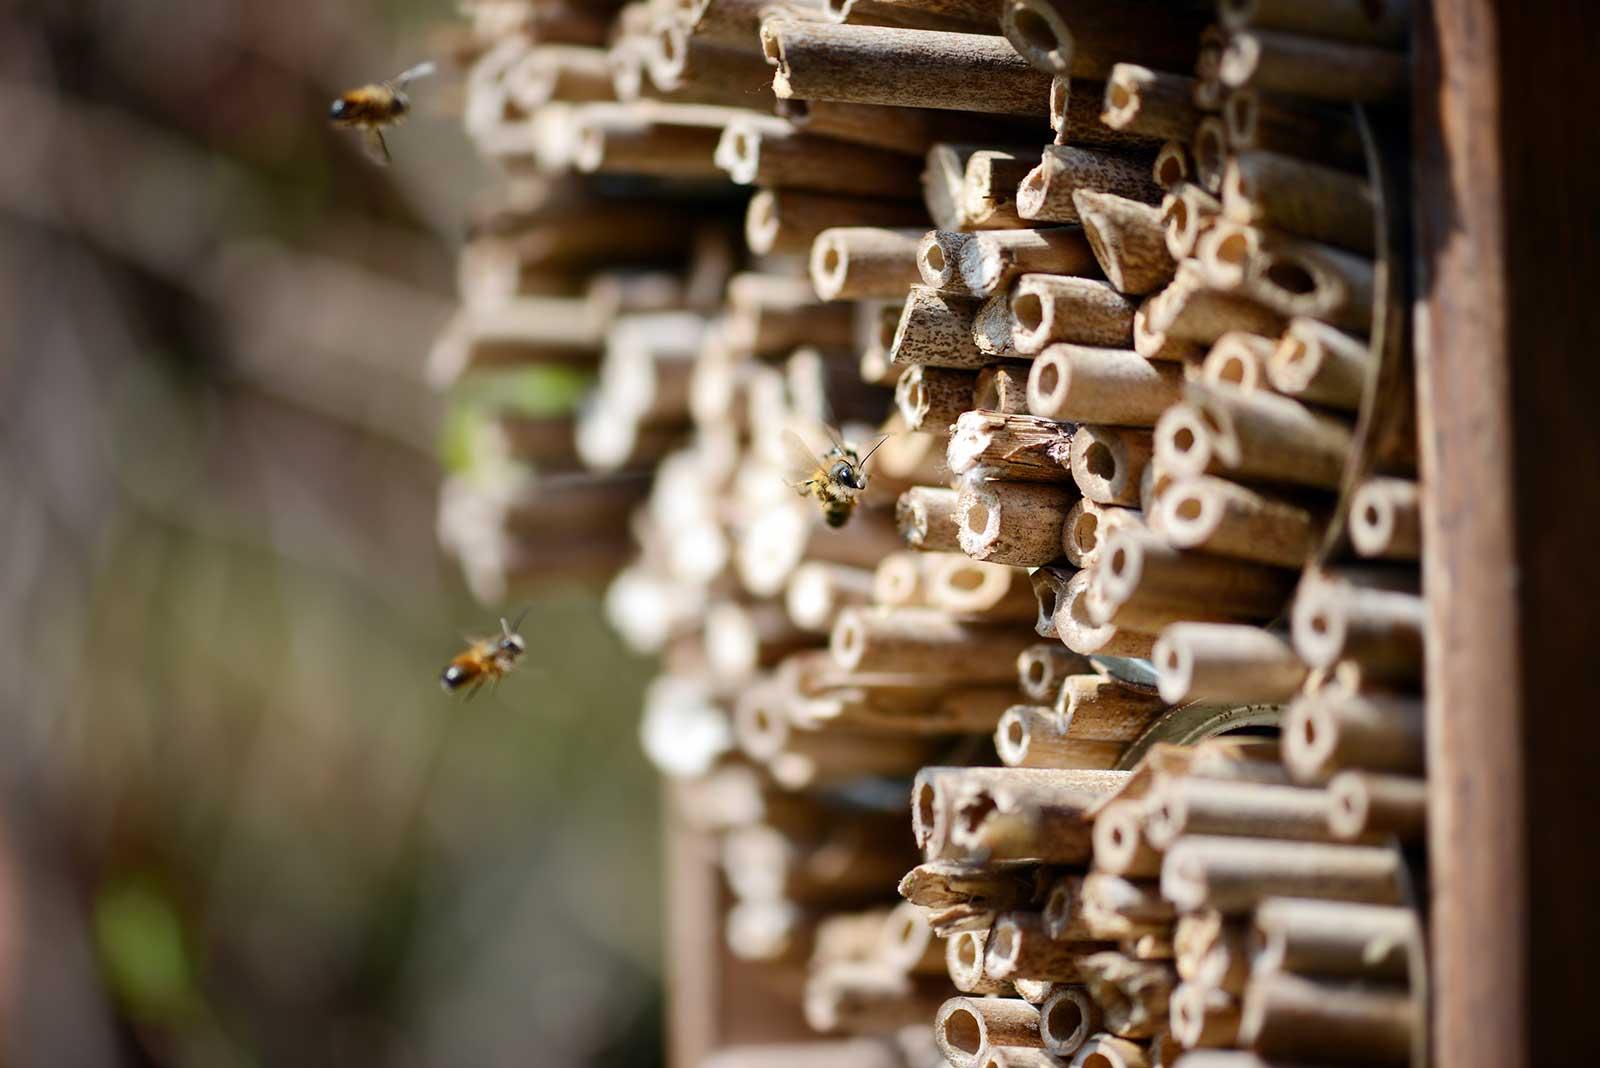 CAILLARD_Visuel-hôtel-à-insectes_abeilles_©-Caillard